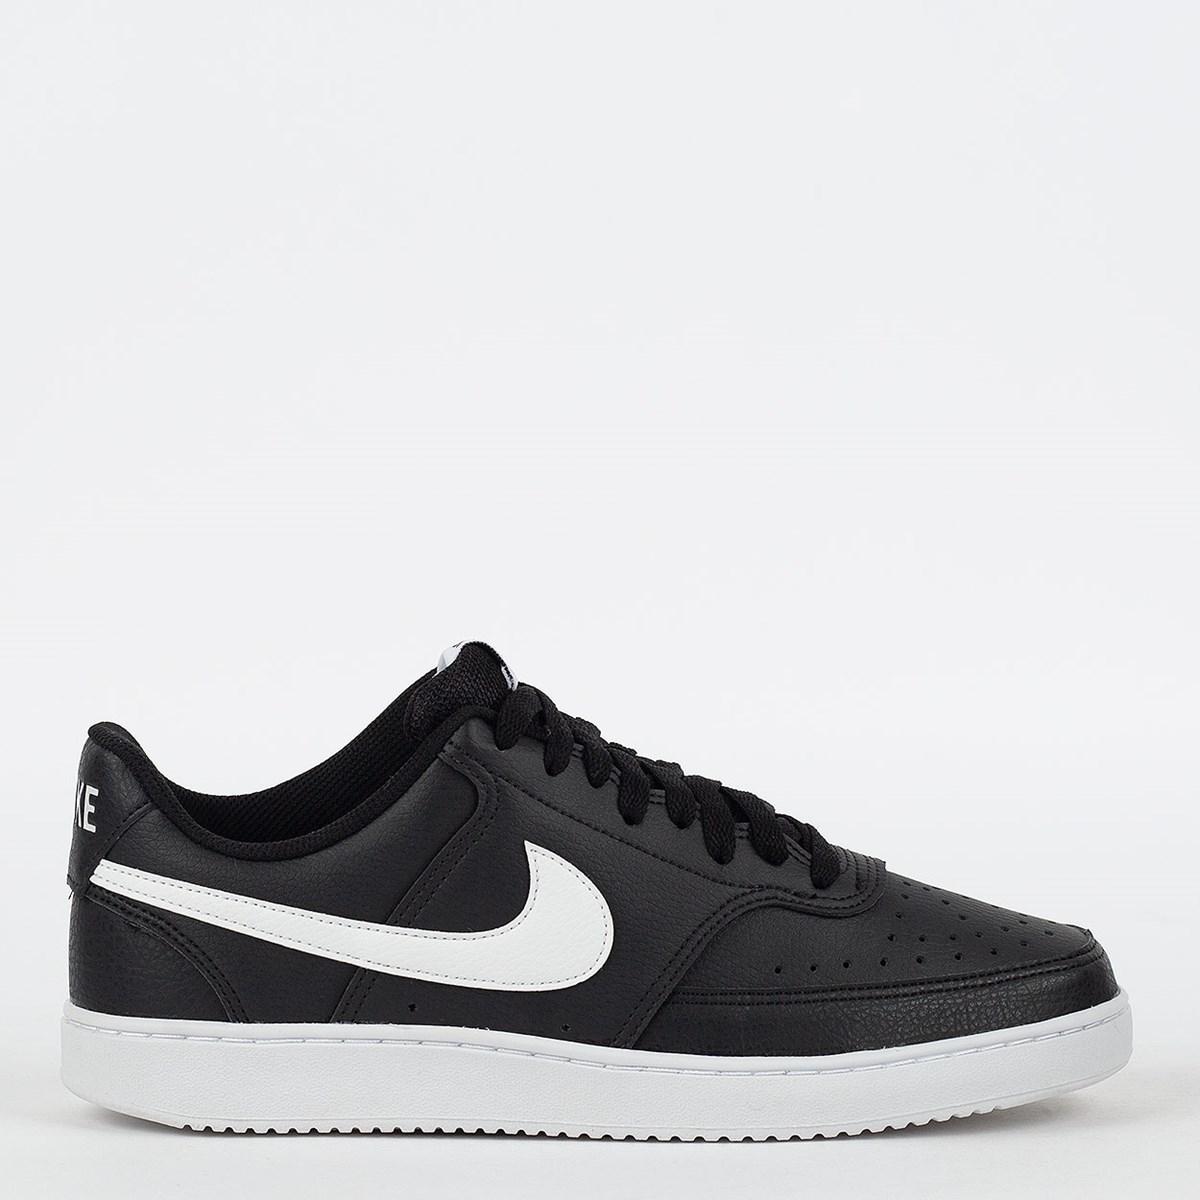 Tênis Nike Court Vision Low Black White CD5463-001